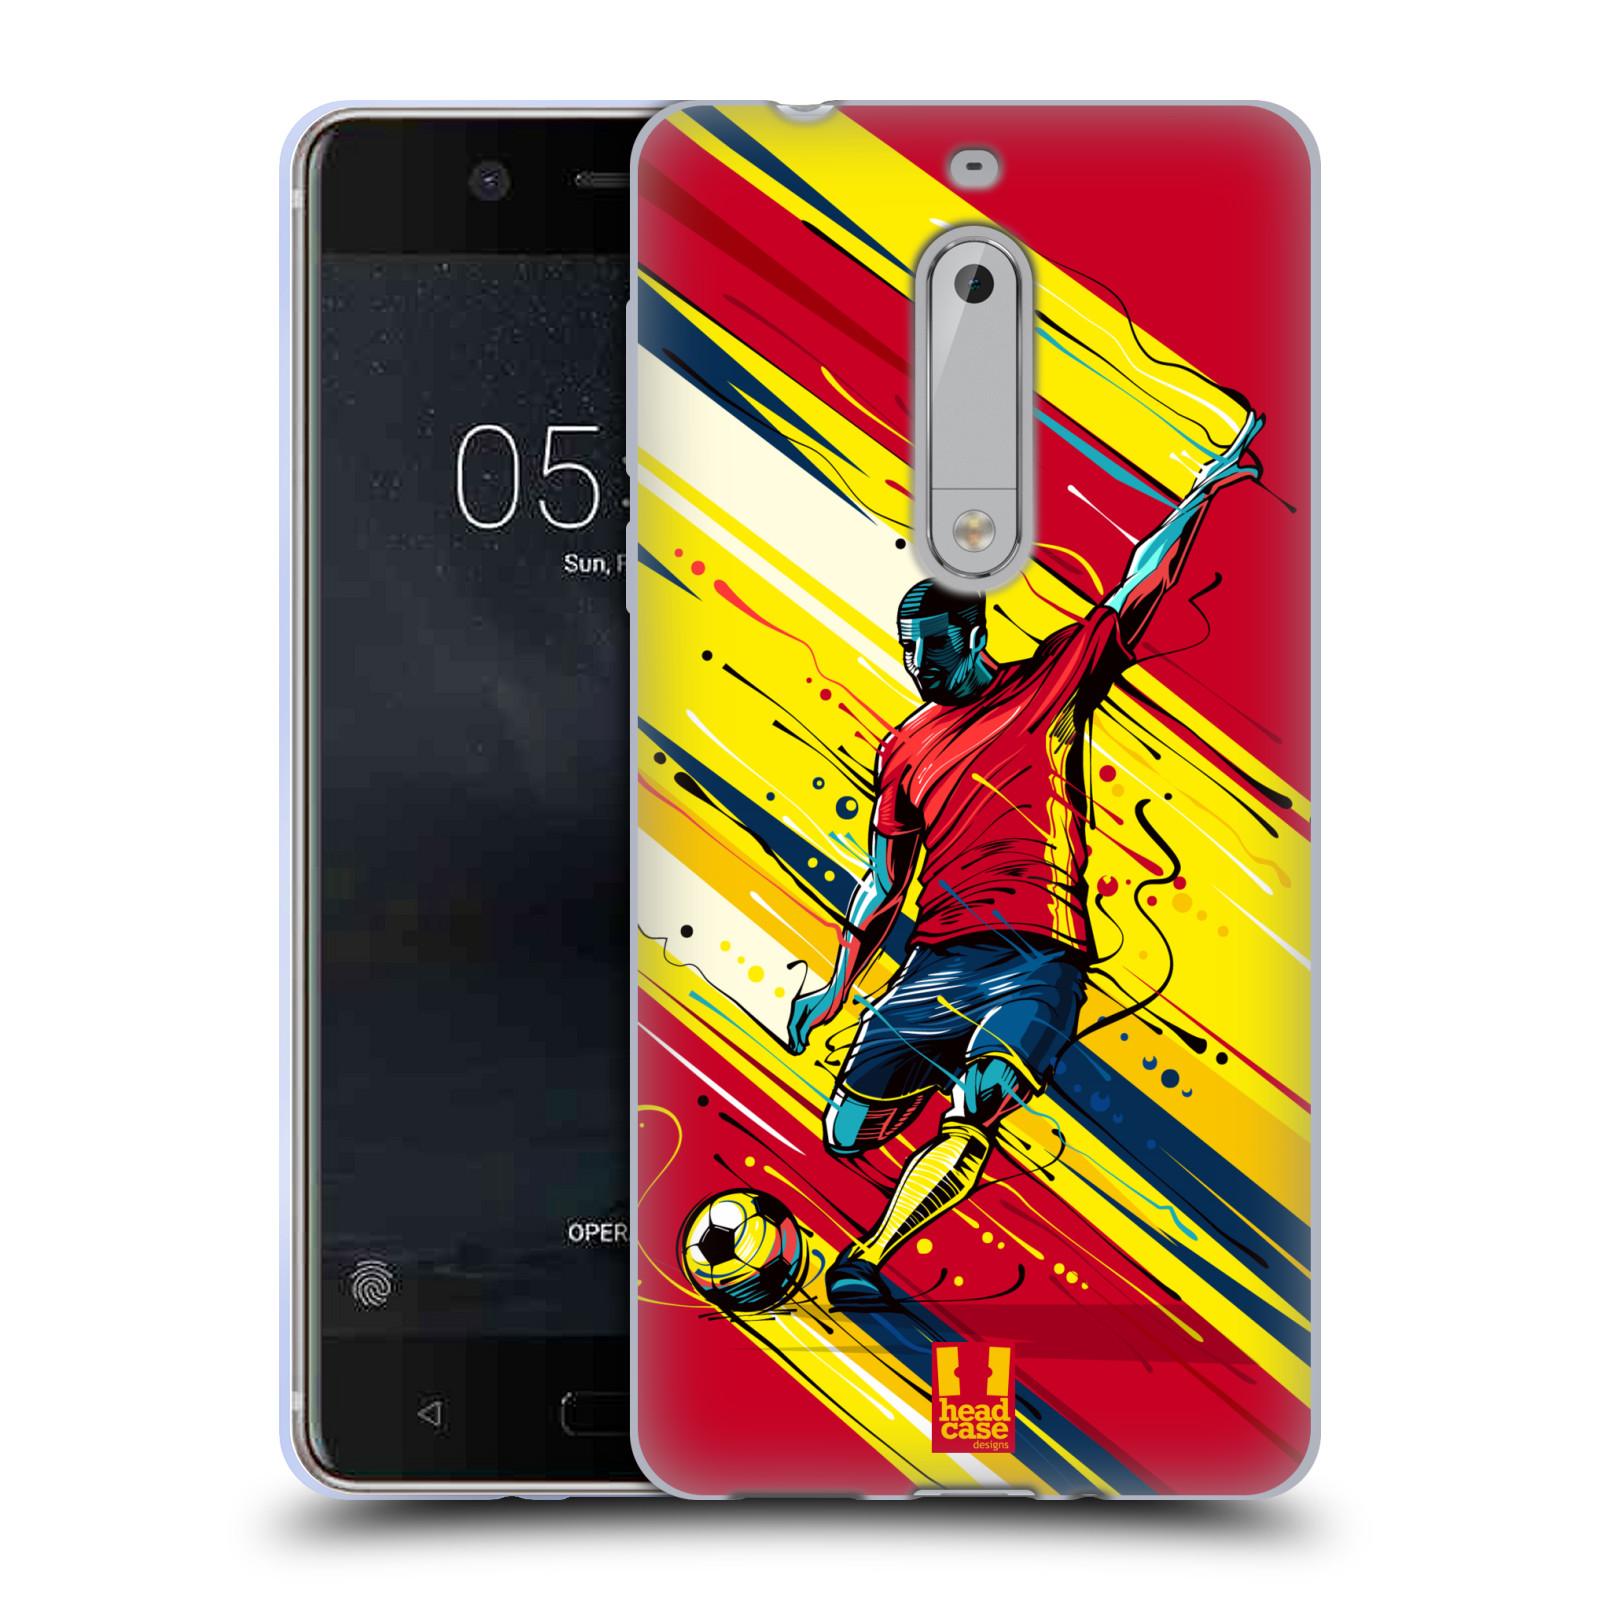 HEAD CASE silikonový obal na mobil Nokia 5 Sport fotbal střela do brány